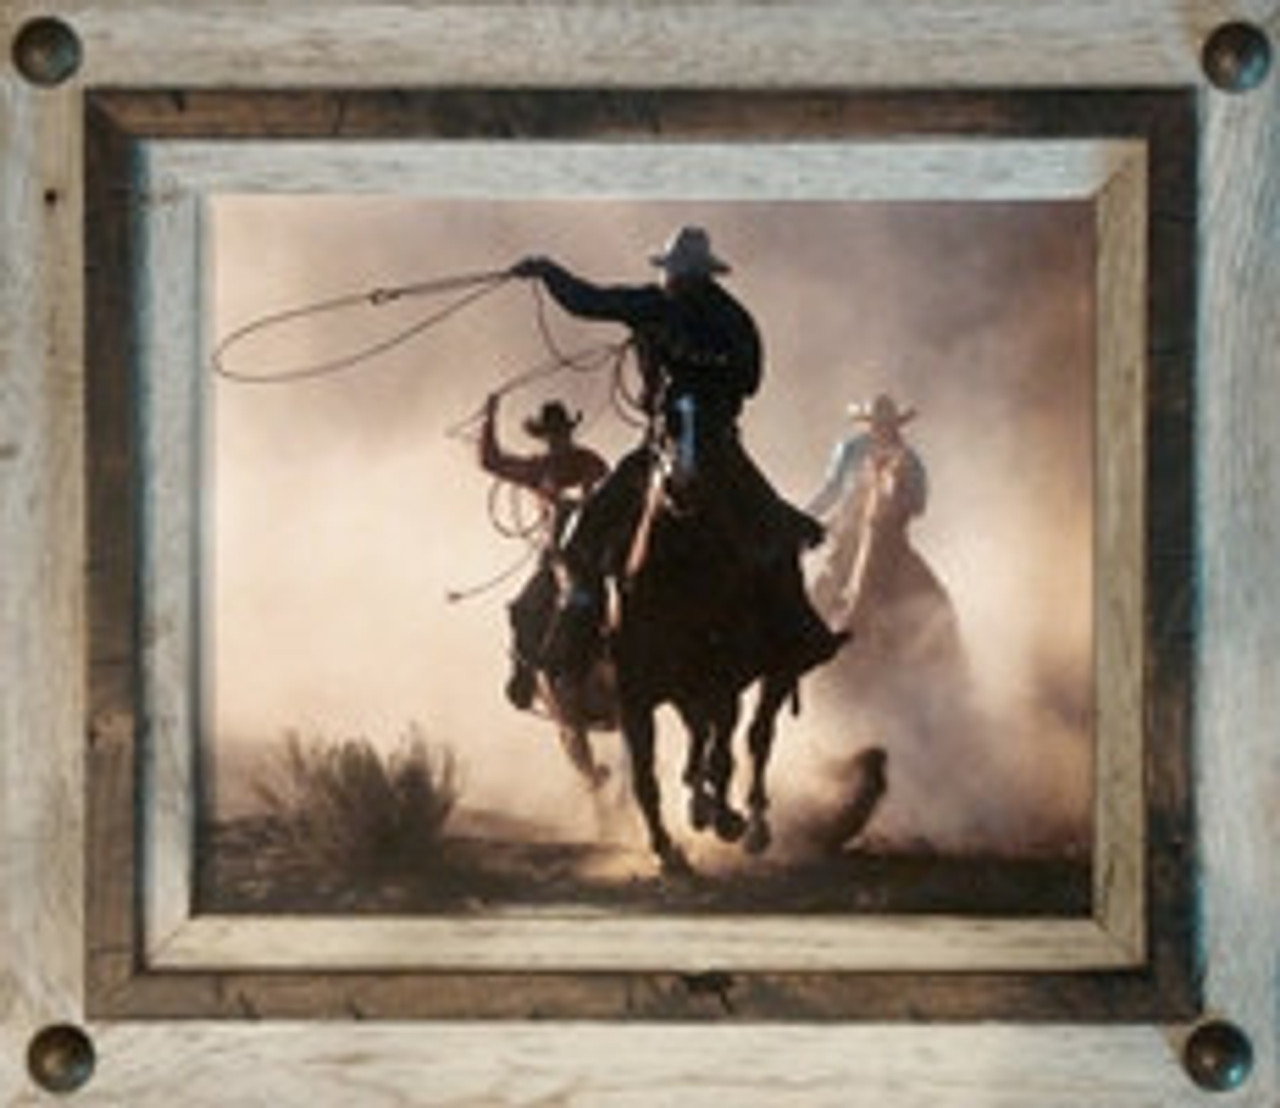 Barnwood Frames | Rustic Reclaimed Wood Picture Frames